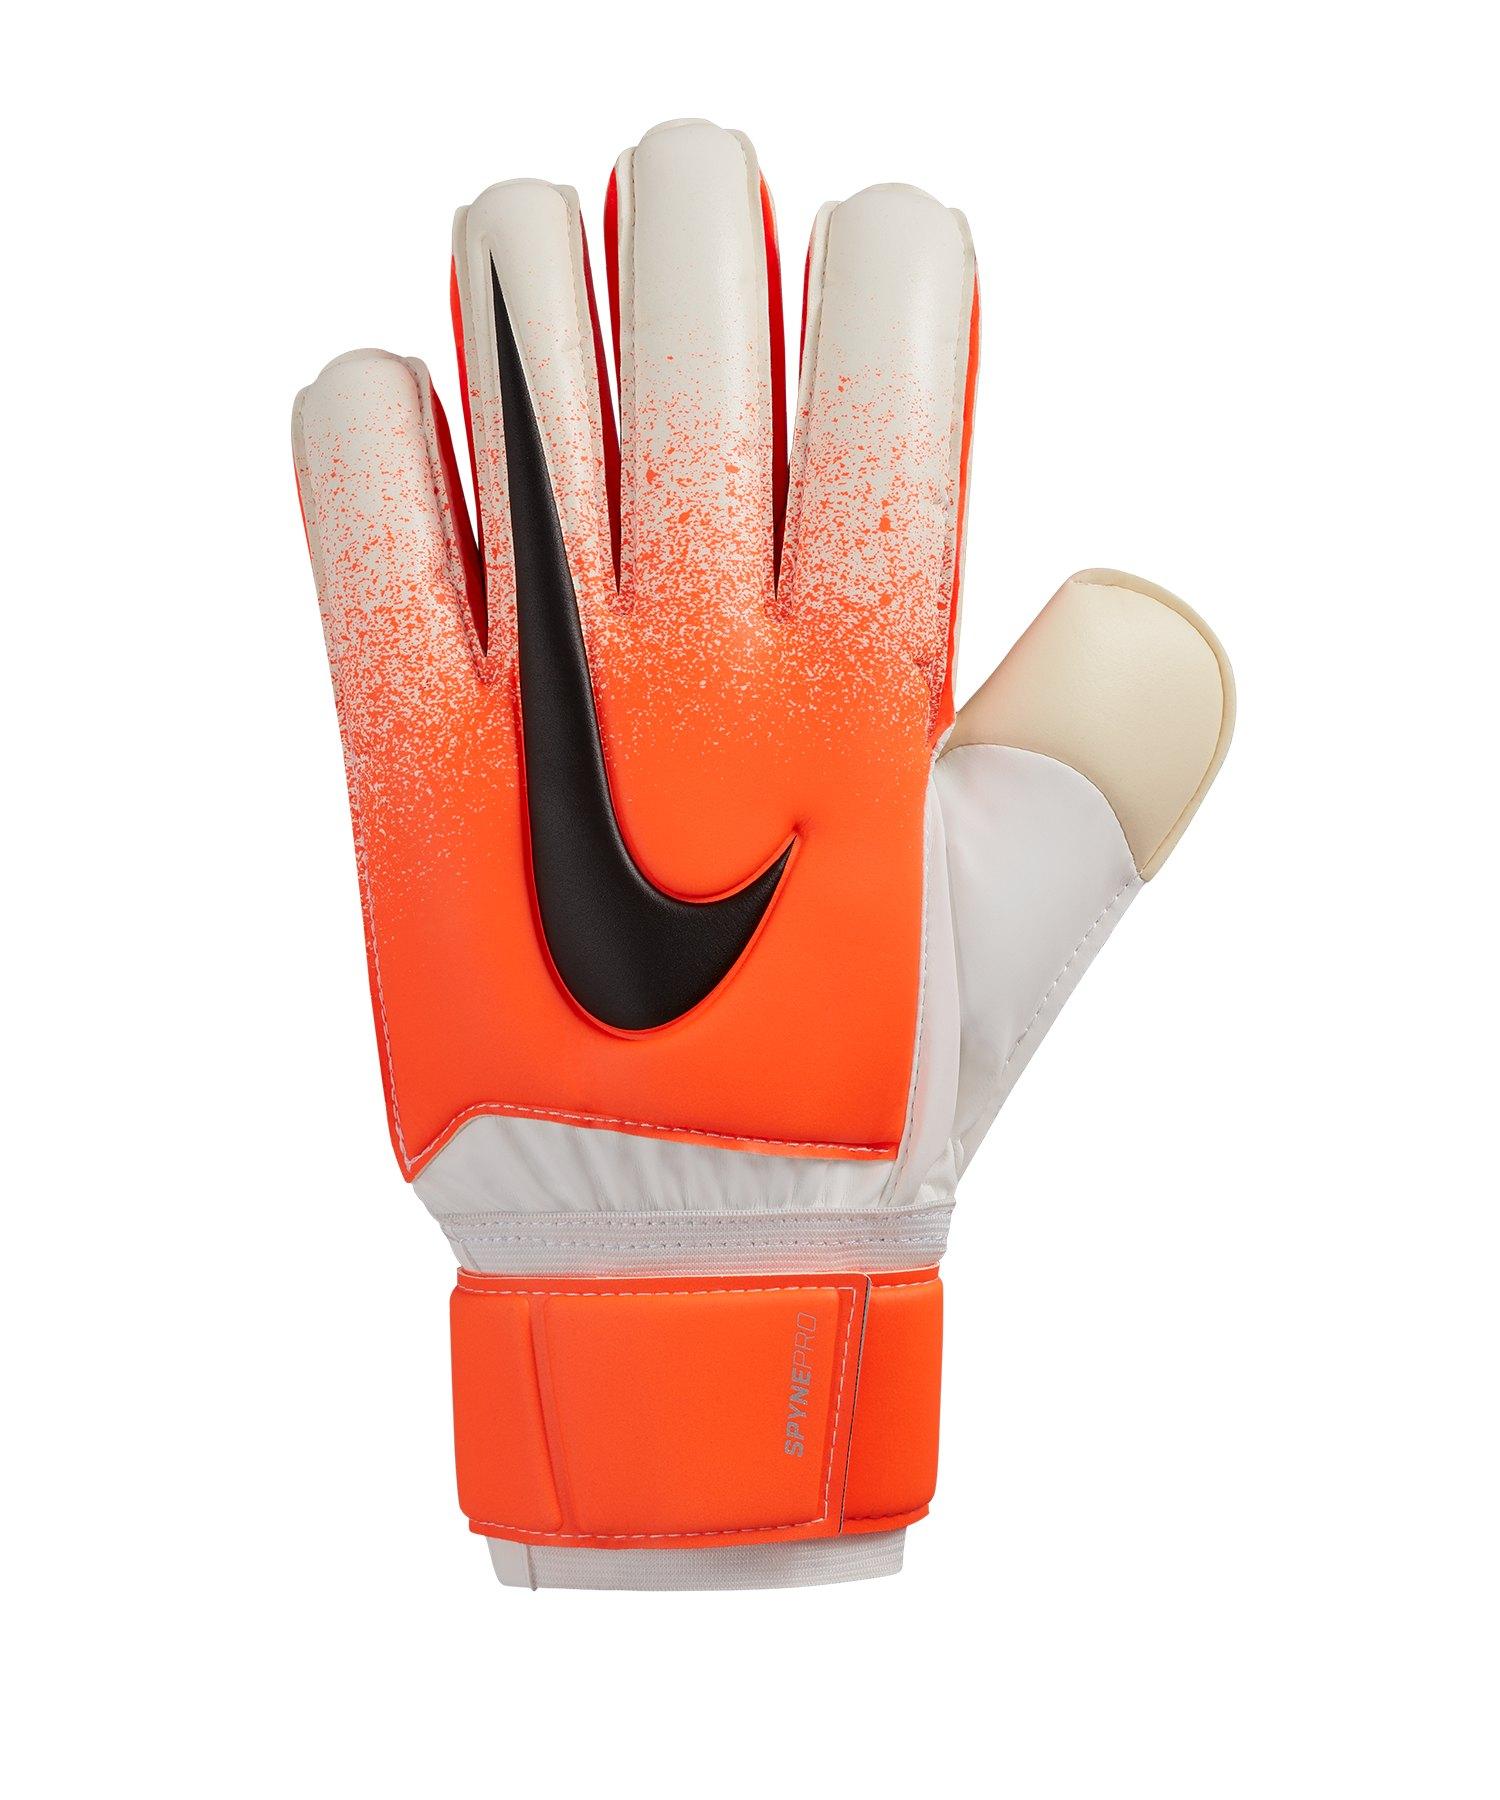 Nike Spyne Pro Torwarthandschuh Rot Weiss F100 - Weiss